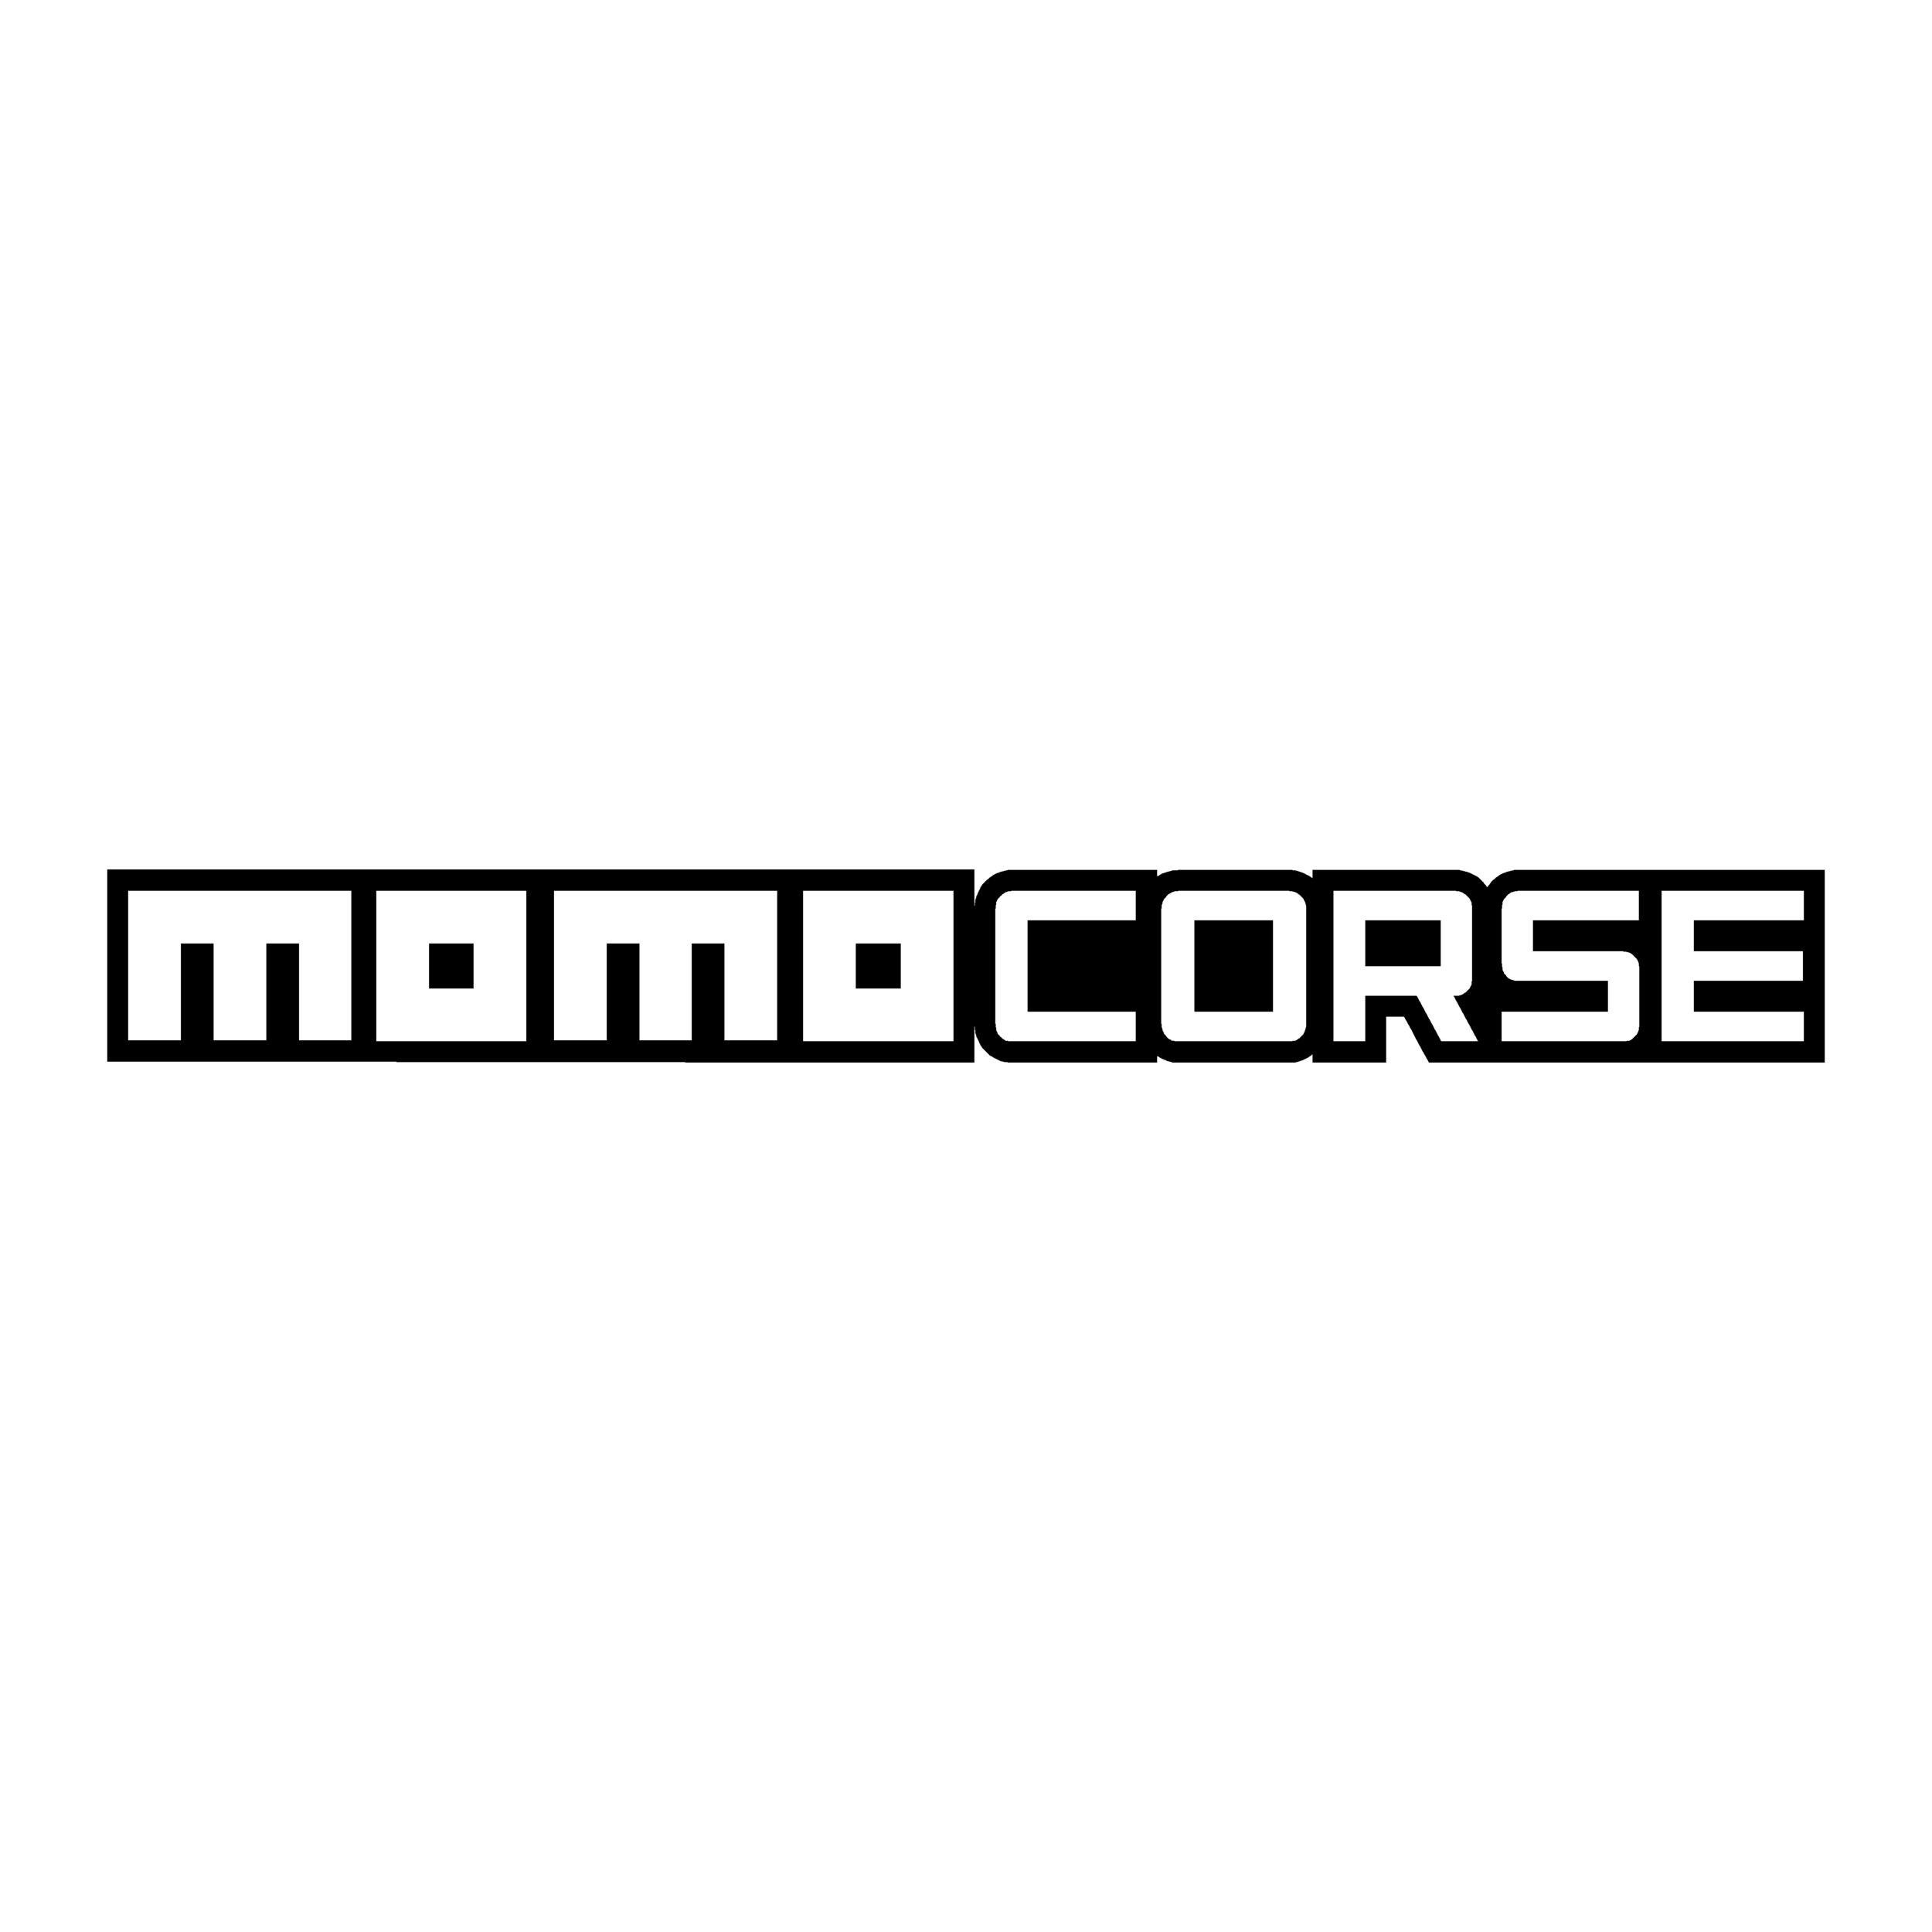 sticker momo ref 6 tuning audio sonorisation car auto moto camion competition deco rallye autocollant